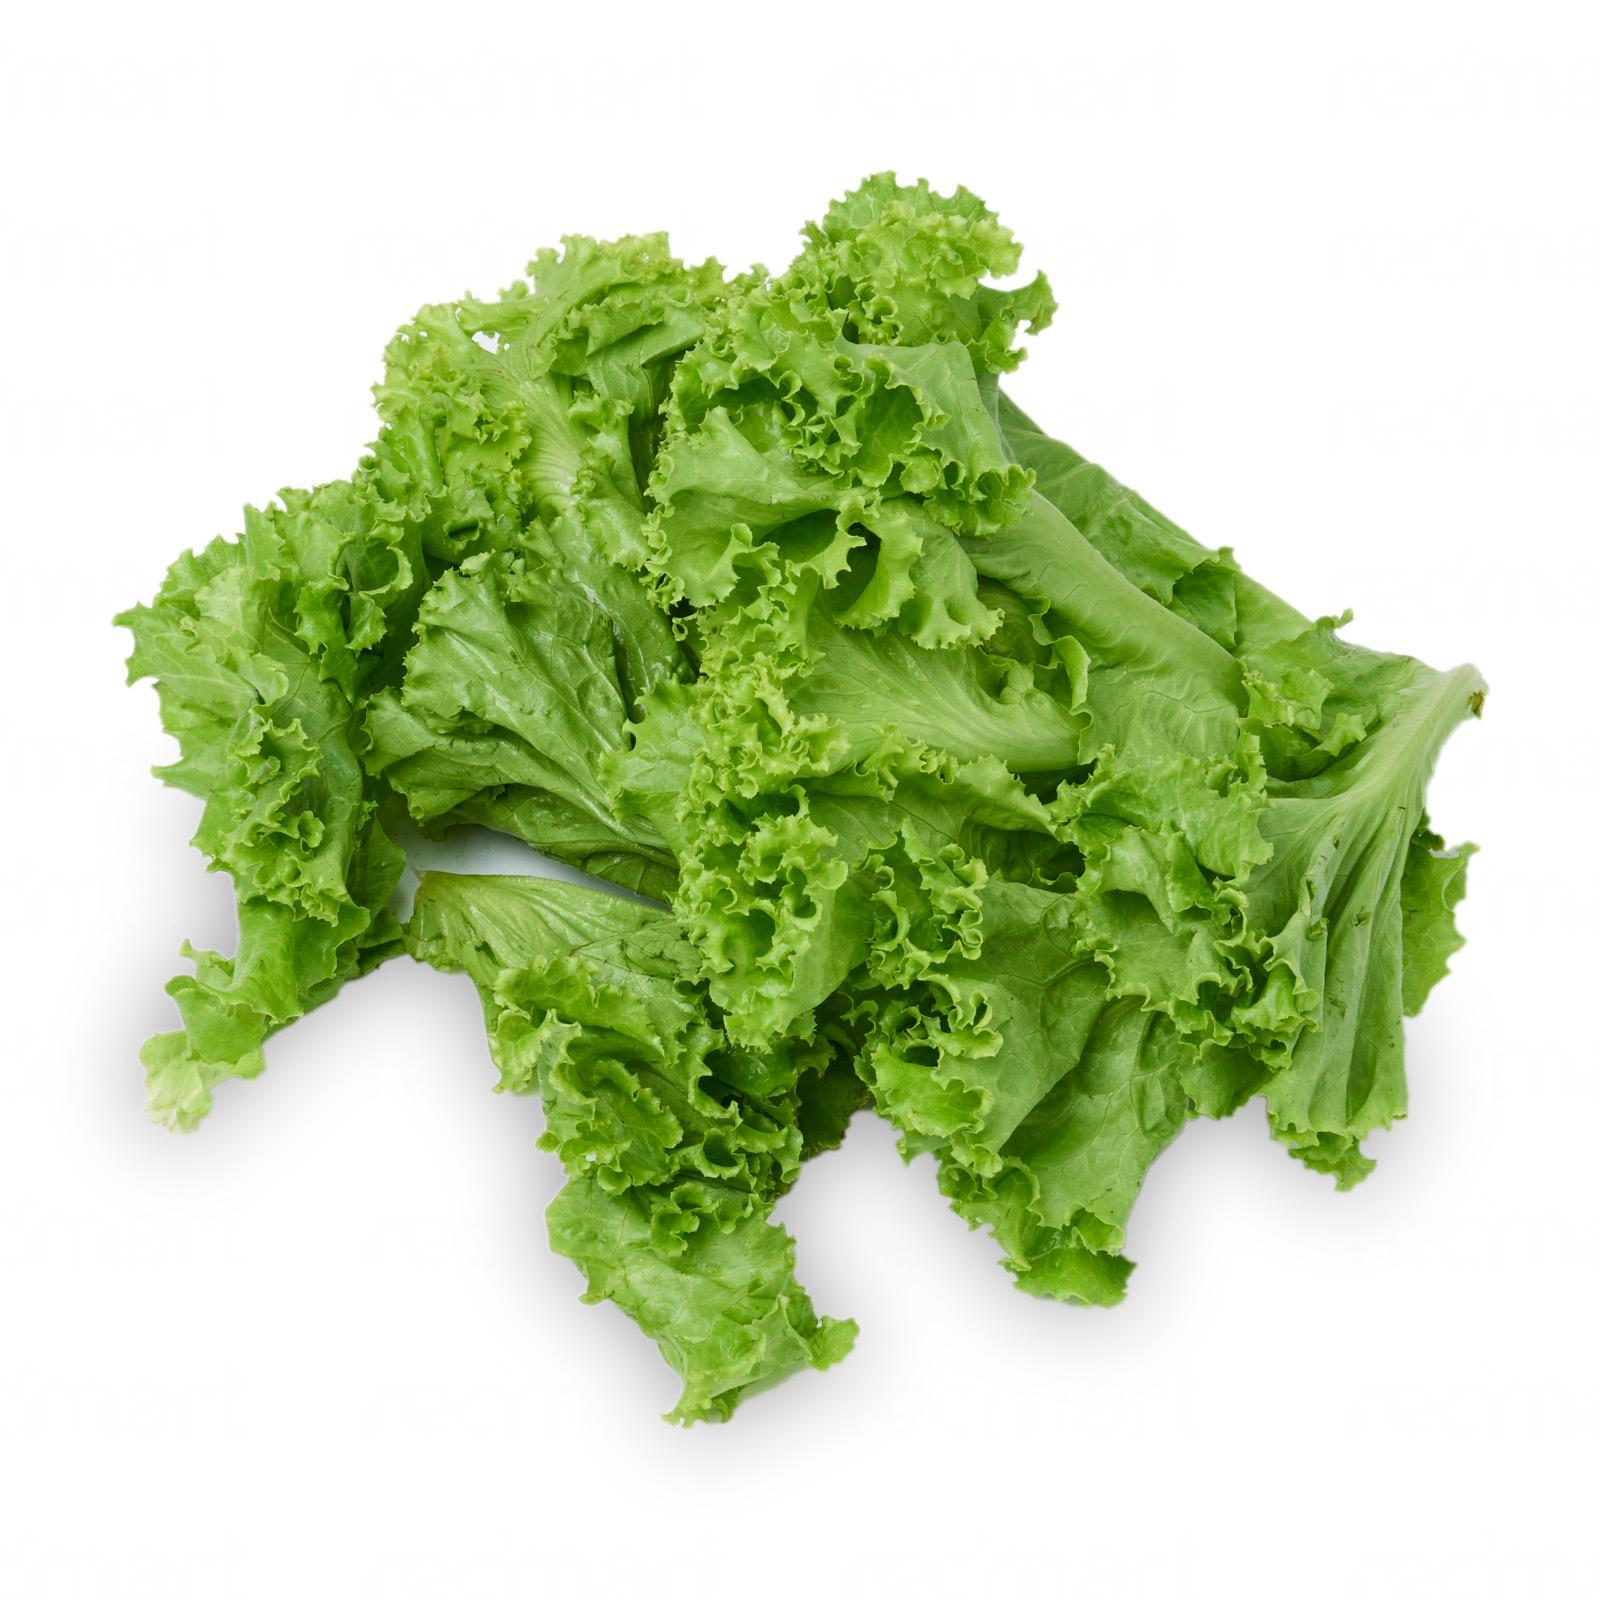 N&p Organic Green Lettuce By Redmart.